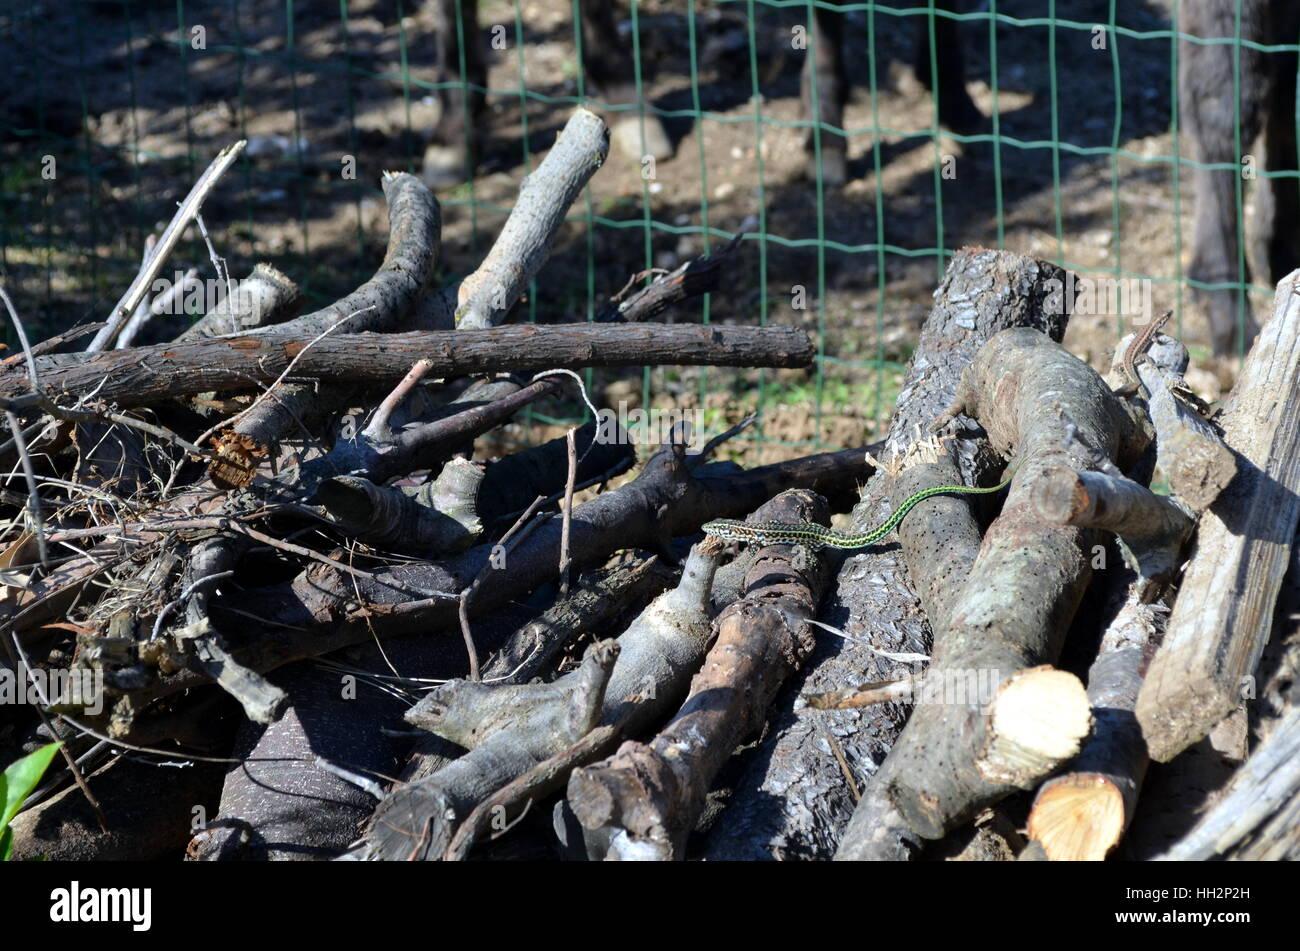 Kleine grüne Ranke Schlange, Ahaetulla Nasuta in einem Holzstapel Chrysopelea ornata Stockfoto